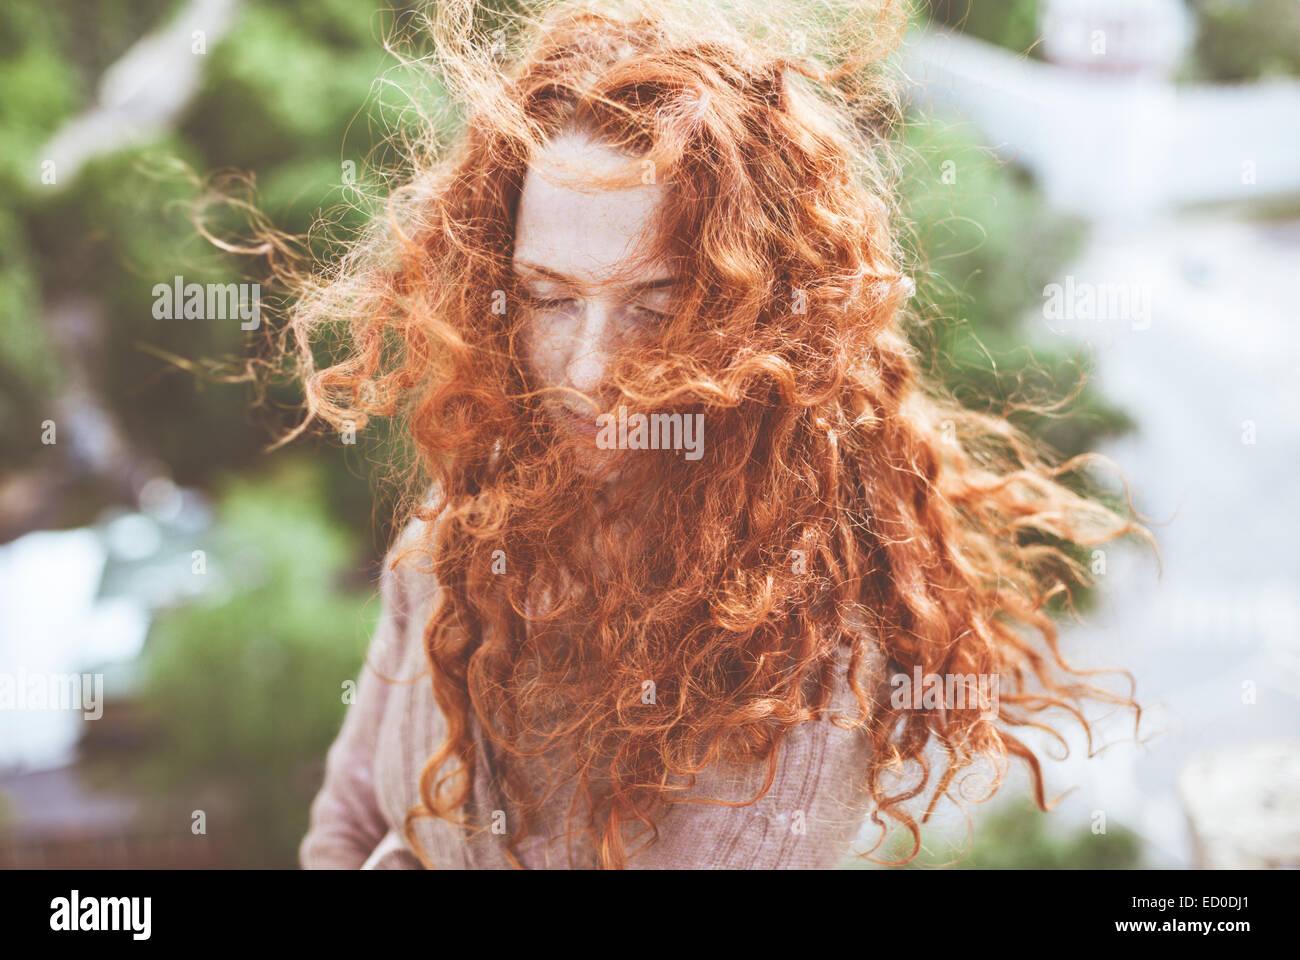 Retrato de mujer joven con largo pelo rojo rizado Imagen De Stock